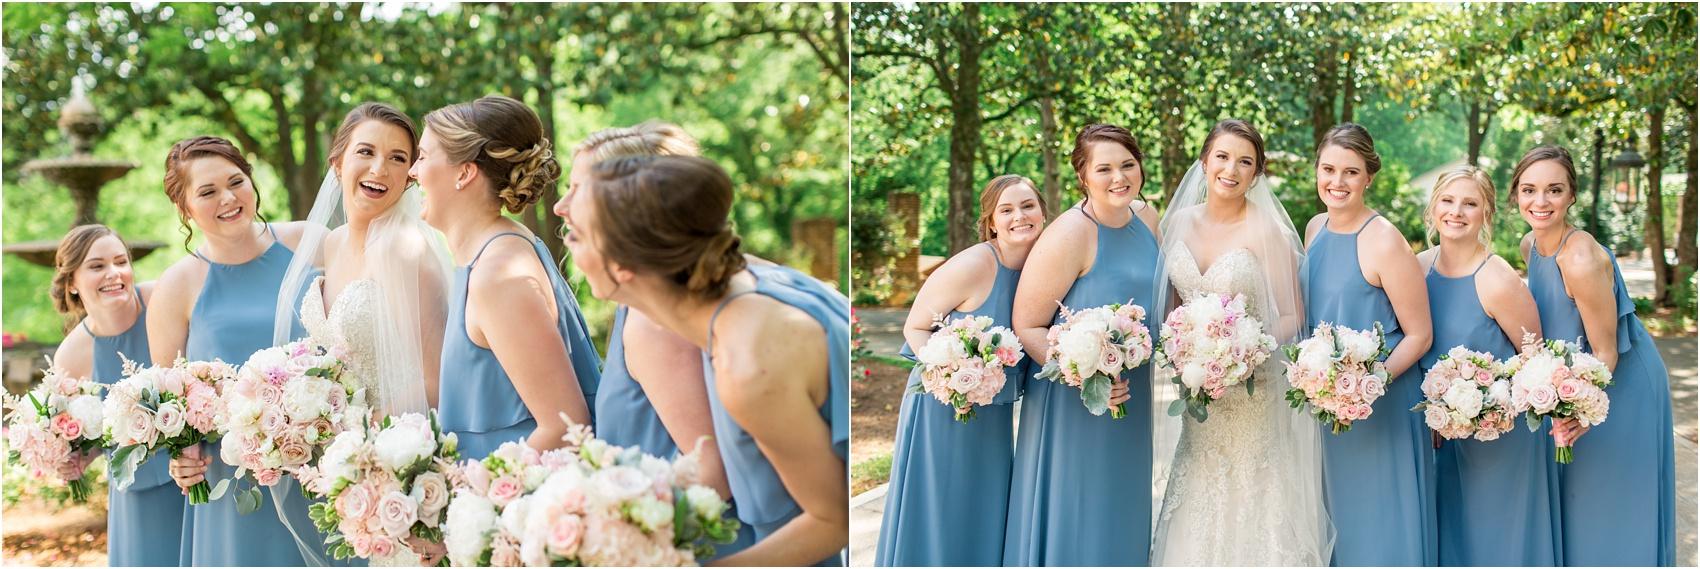 Savannah Eve Photography- Nutt Wedding- Blog-54.jpg